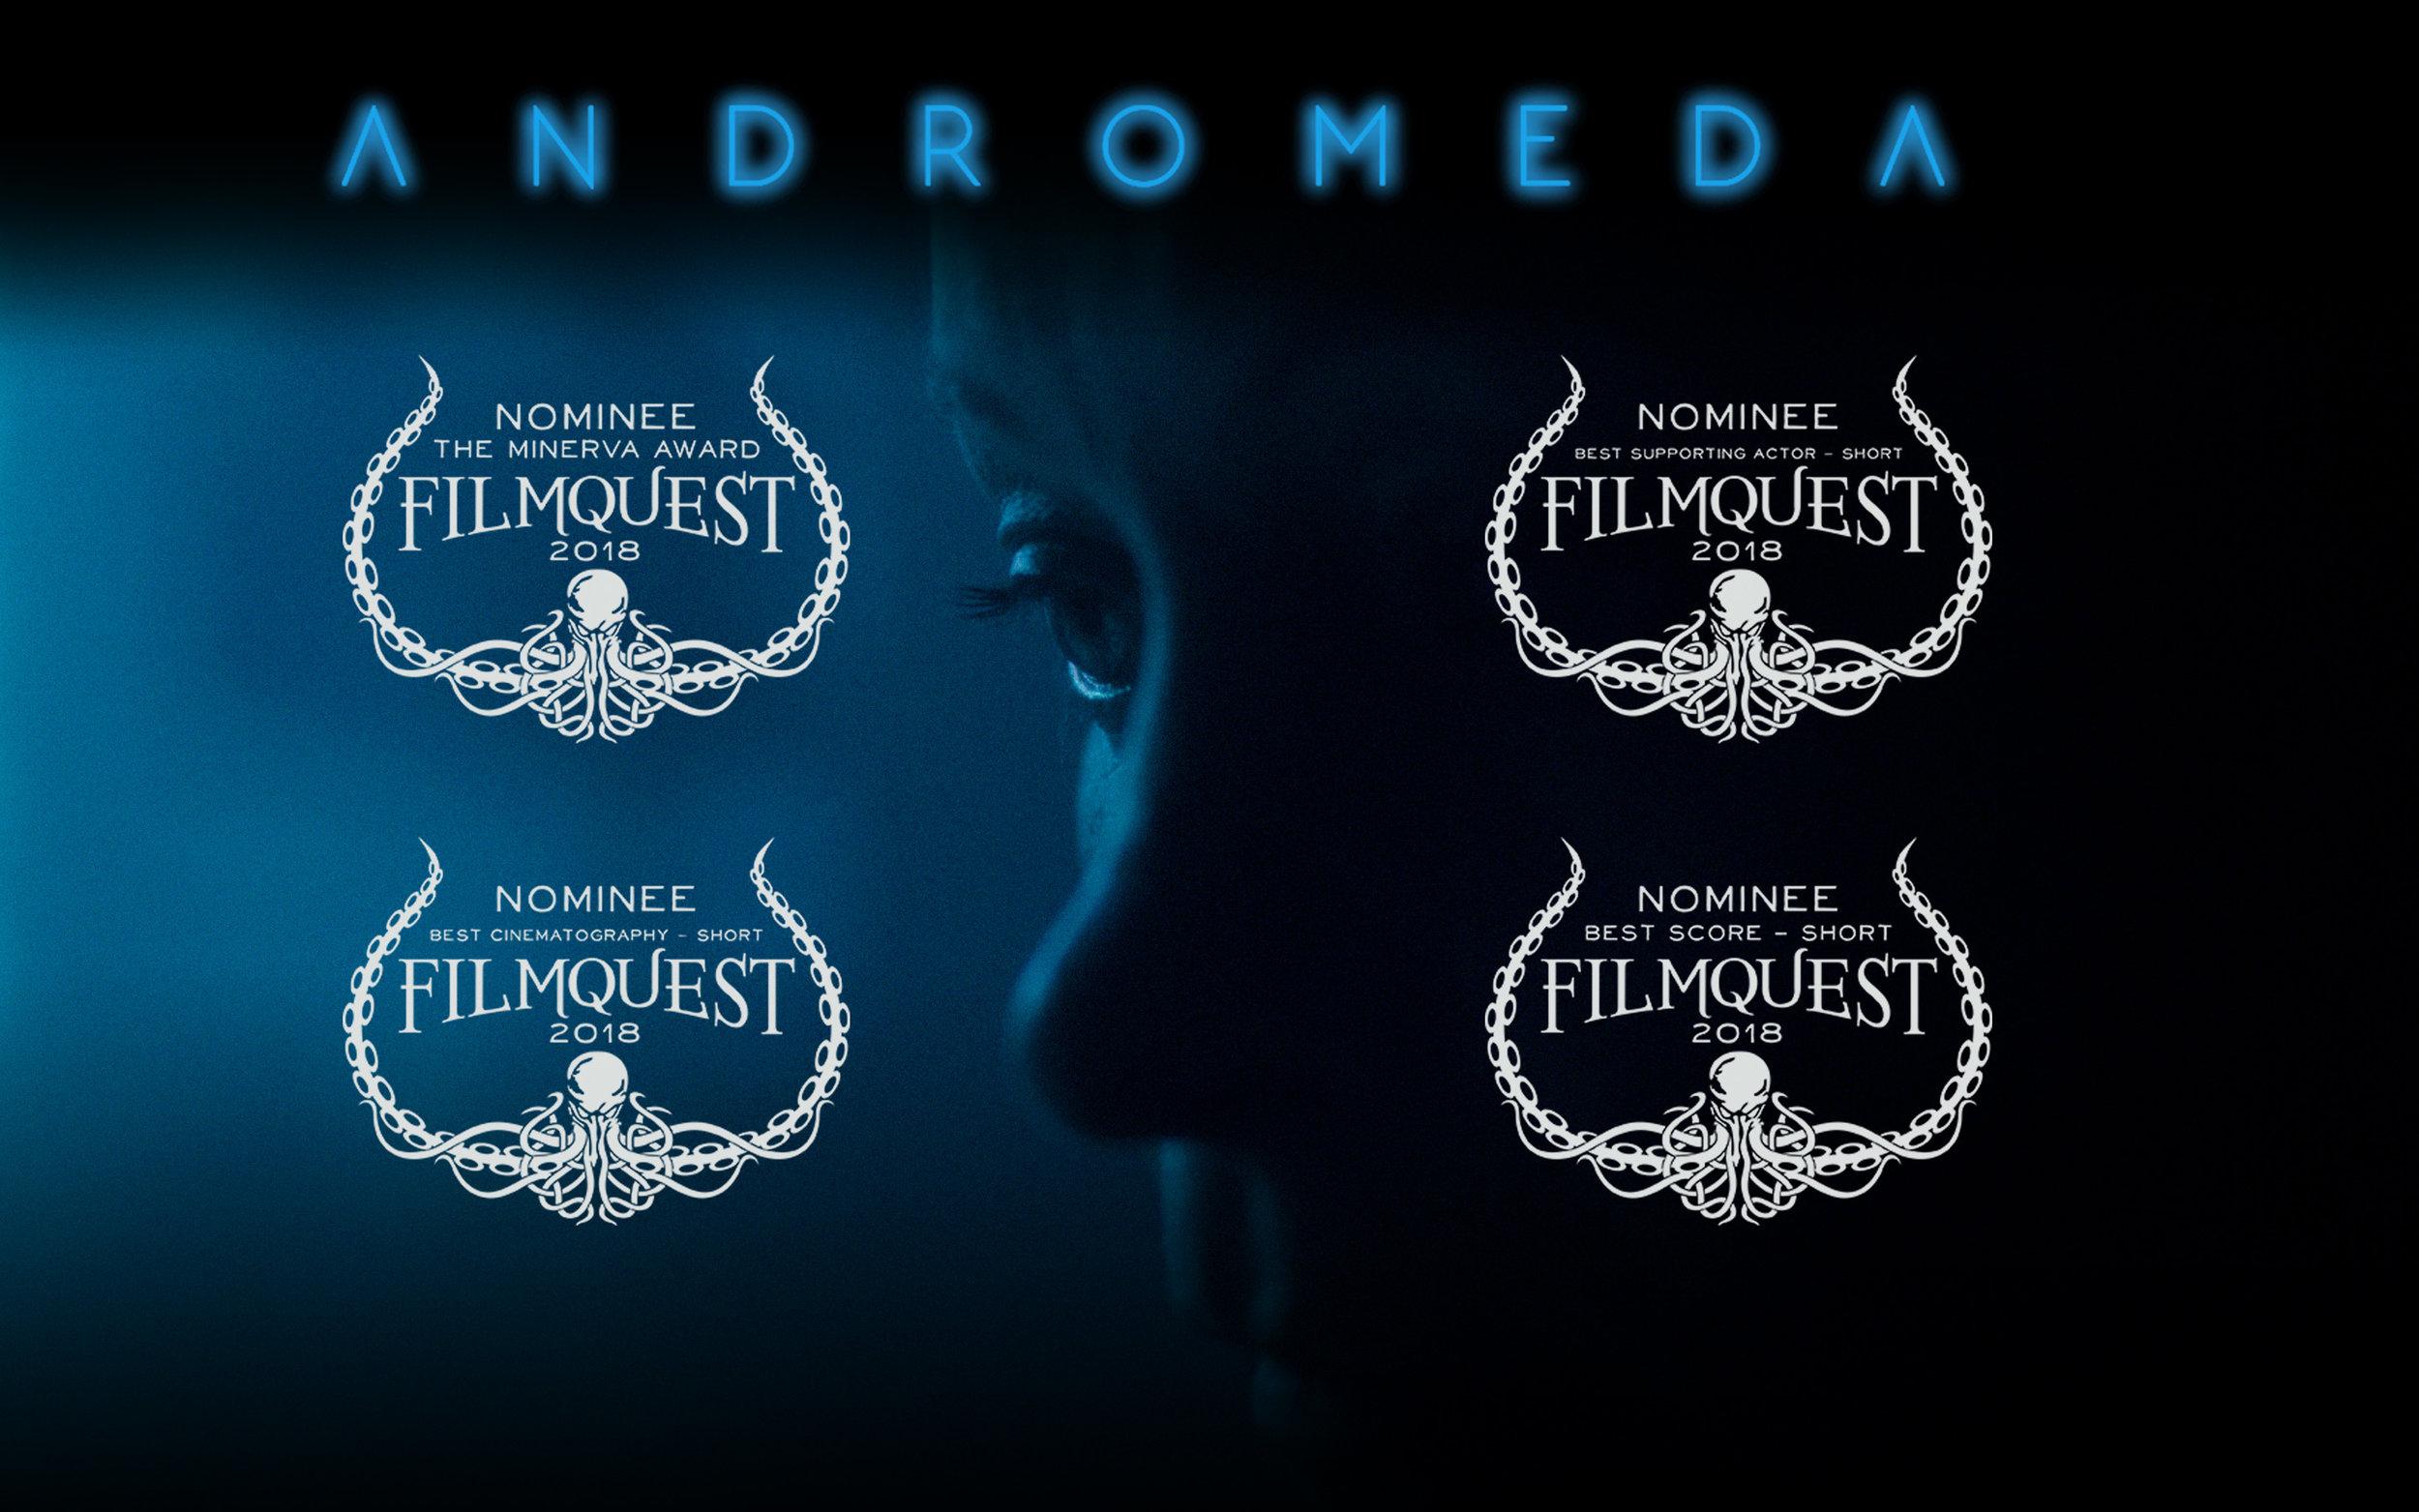 FILMQUEST_andromeda_awards_noms.jpg